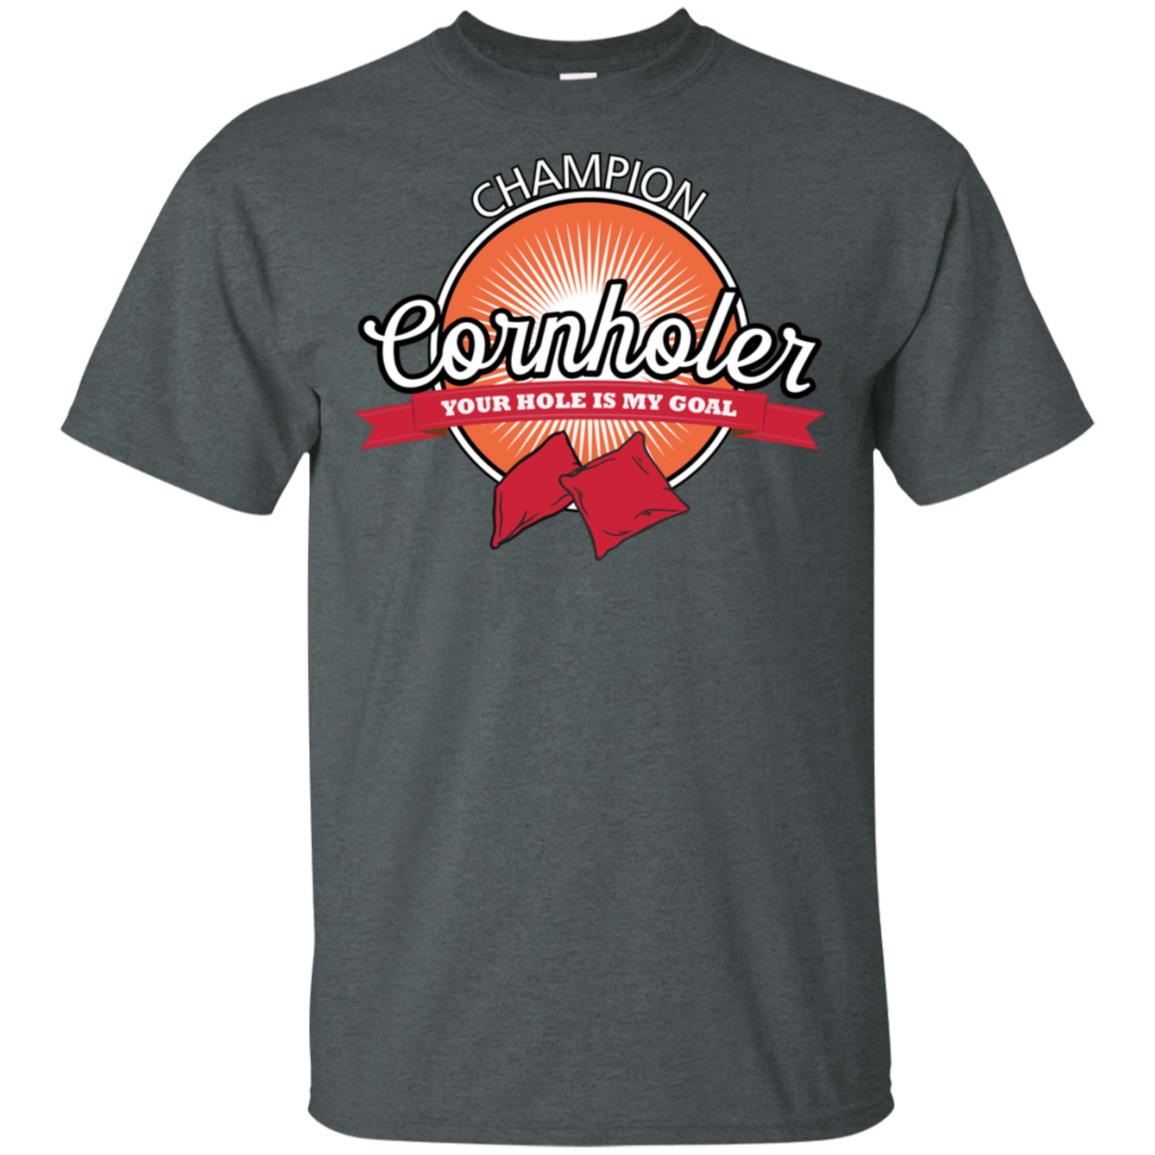 Champion Cornholer Funny Team Cornhole Unisex Short Sleeve